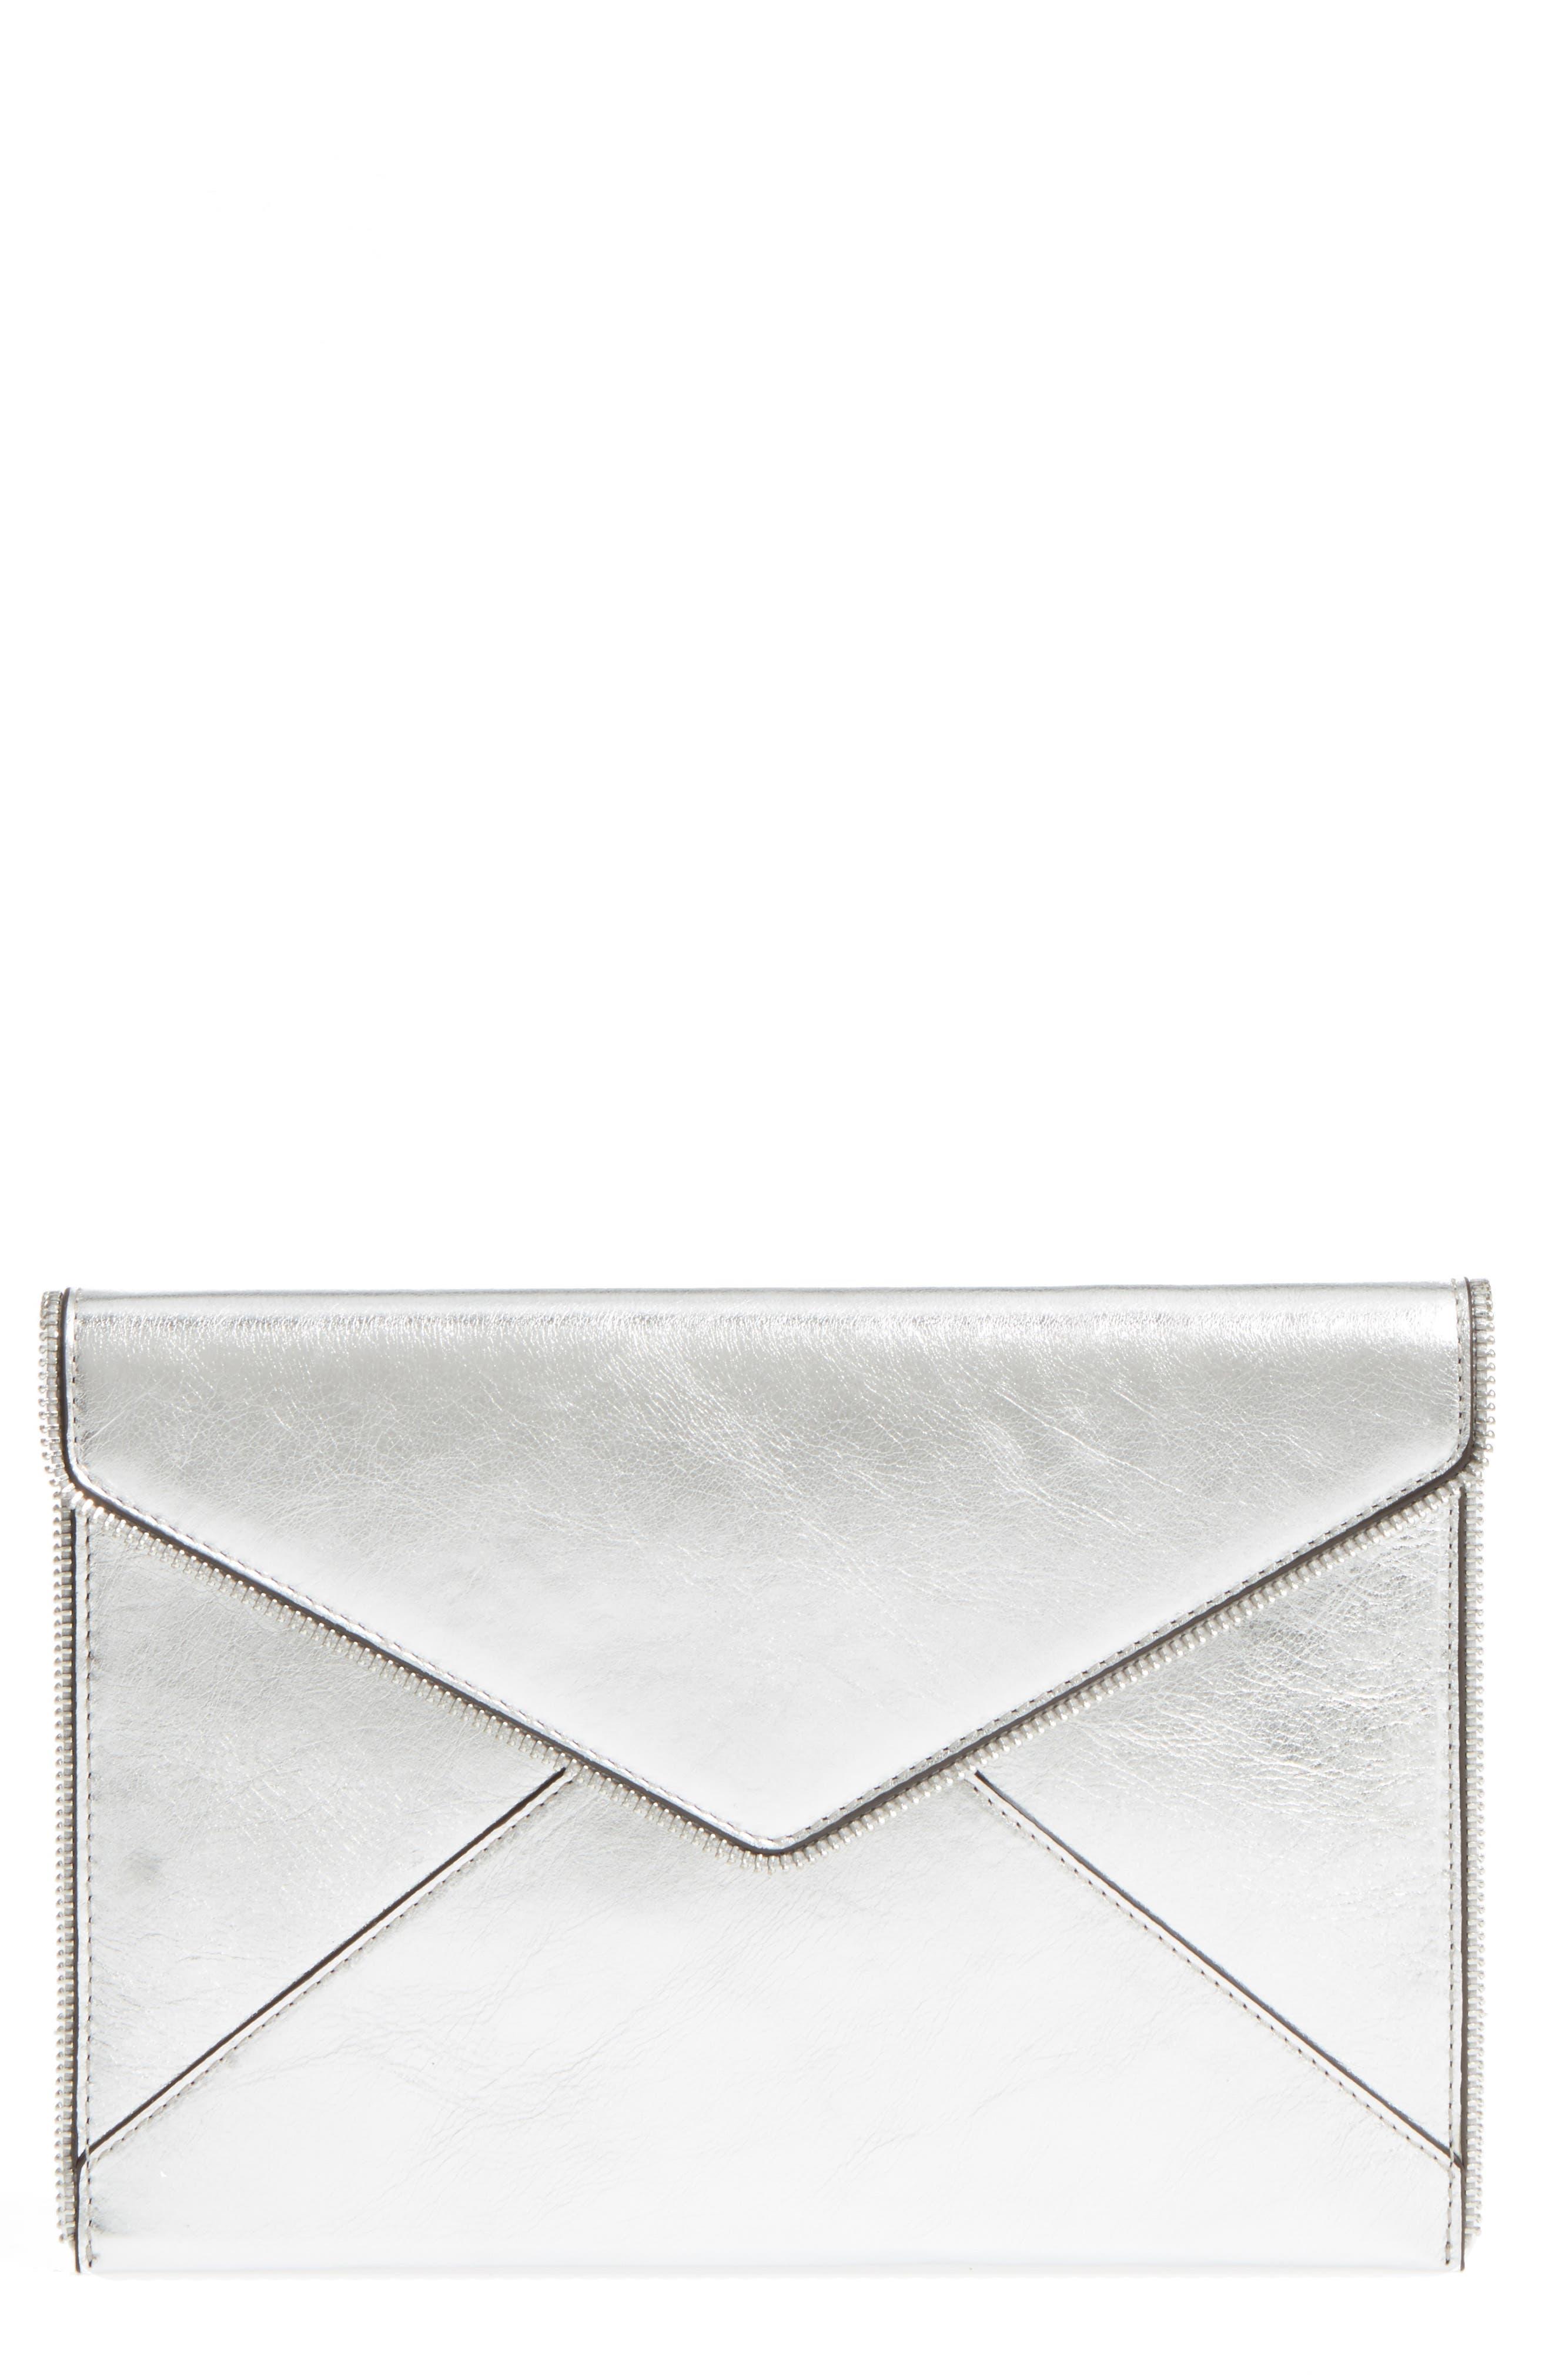 Alternate Image 1 Selected - Rebecca Minkoff Leo Mirror Metallic Envelope Clutch